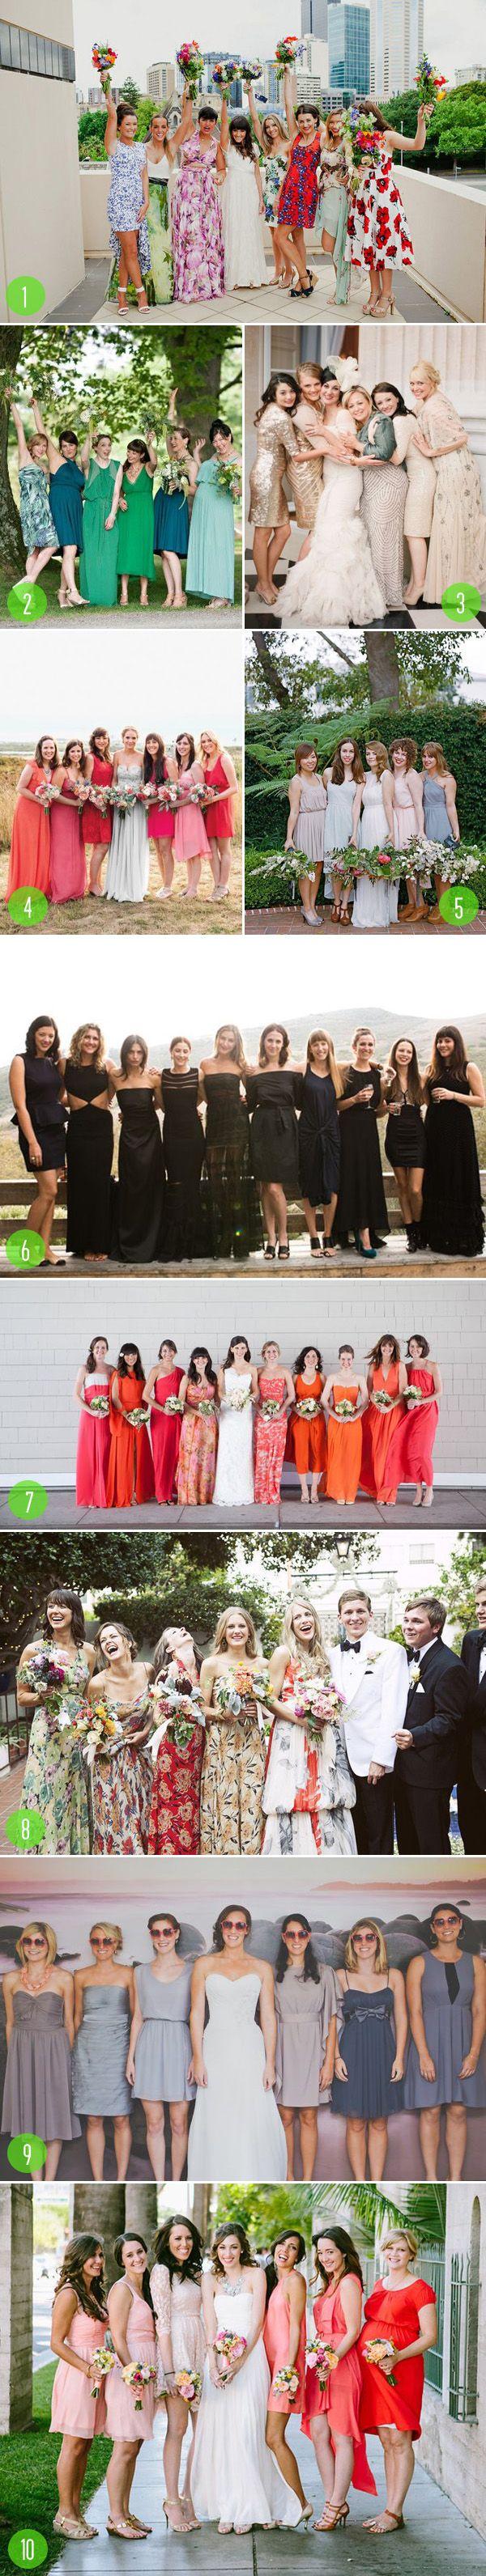 top 10: mismatch bridesmaids